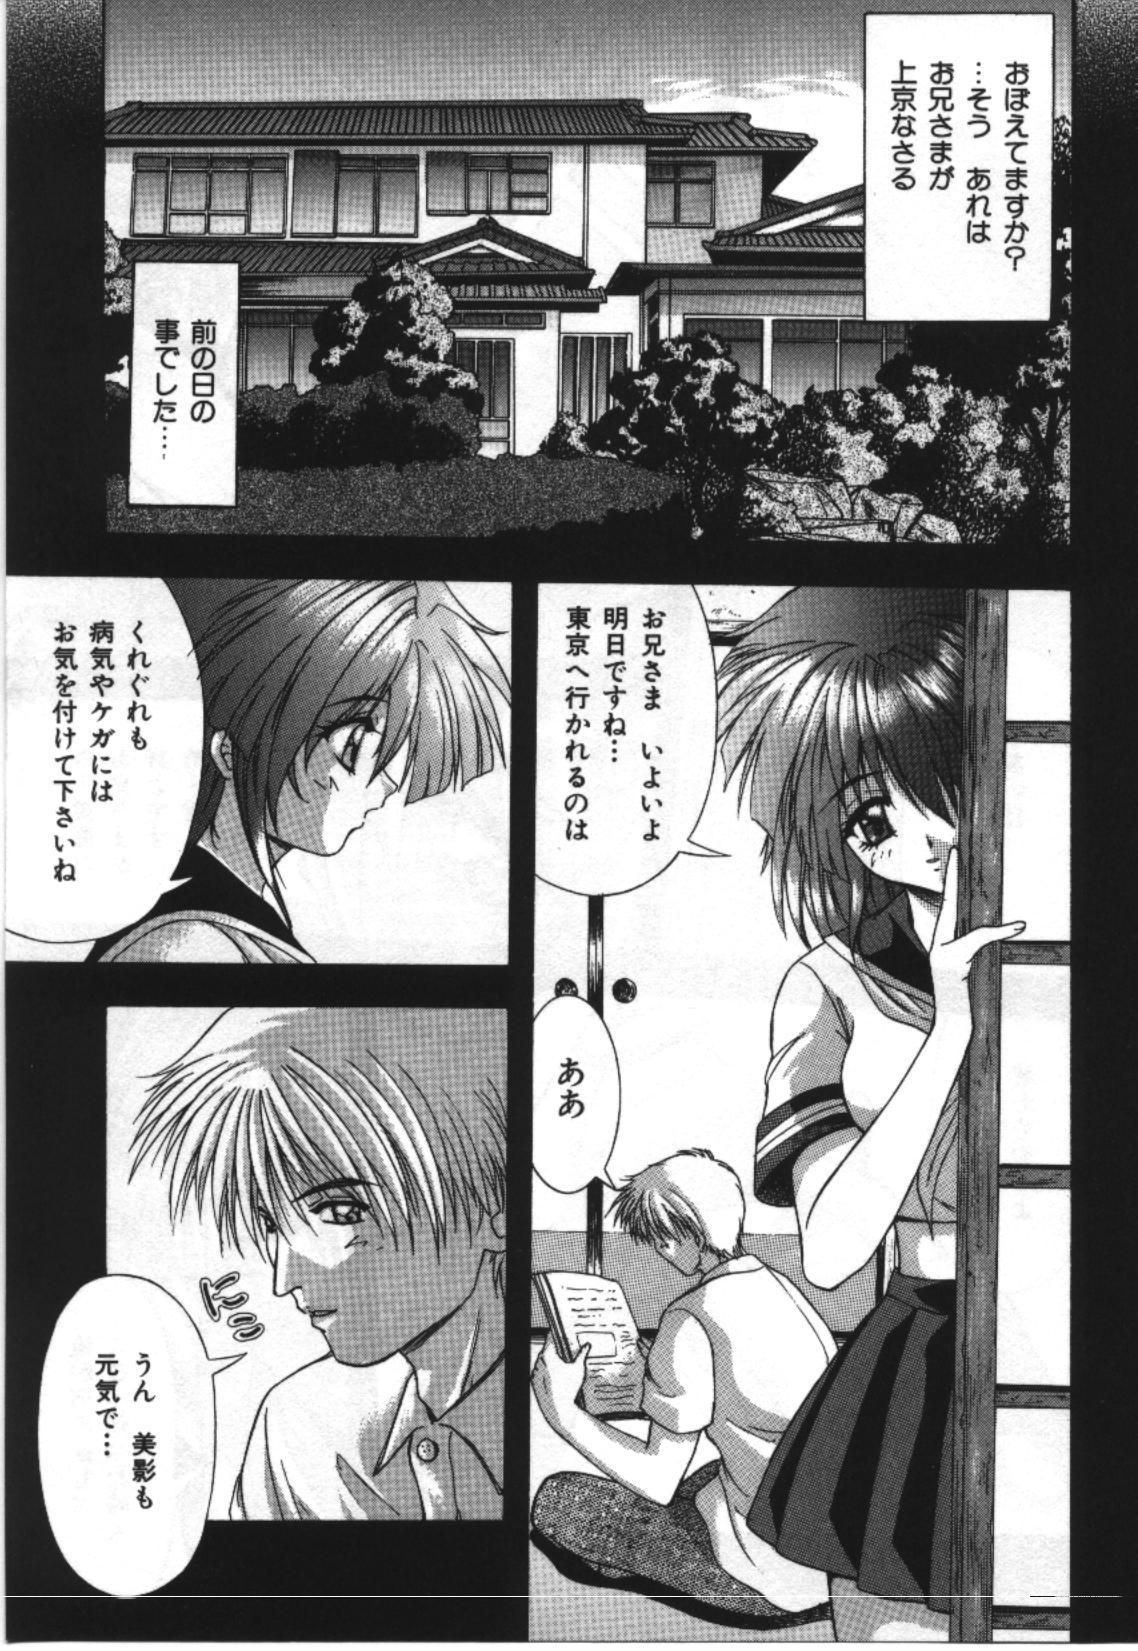 Imouto Koishi 2 122